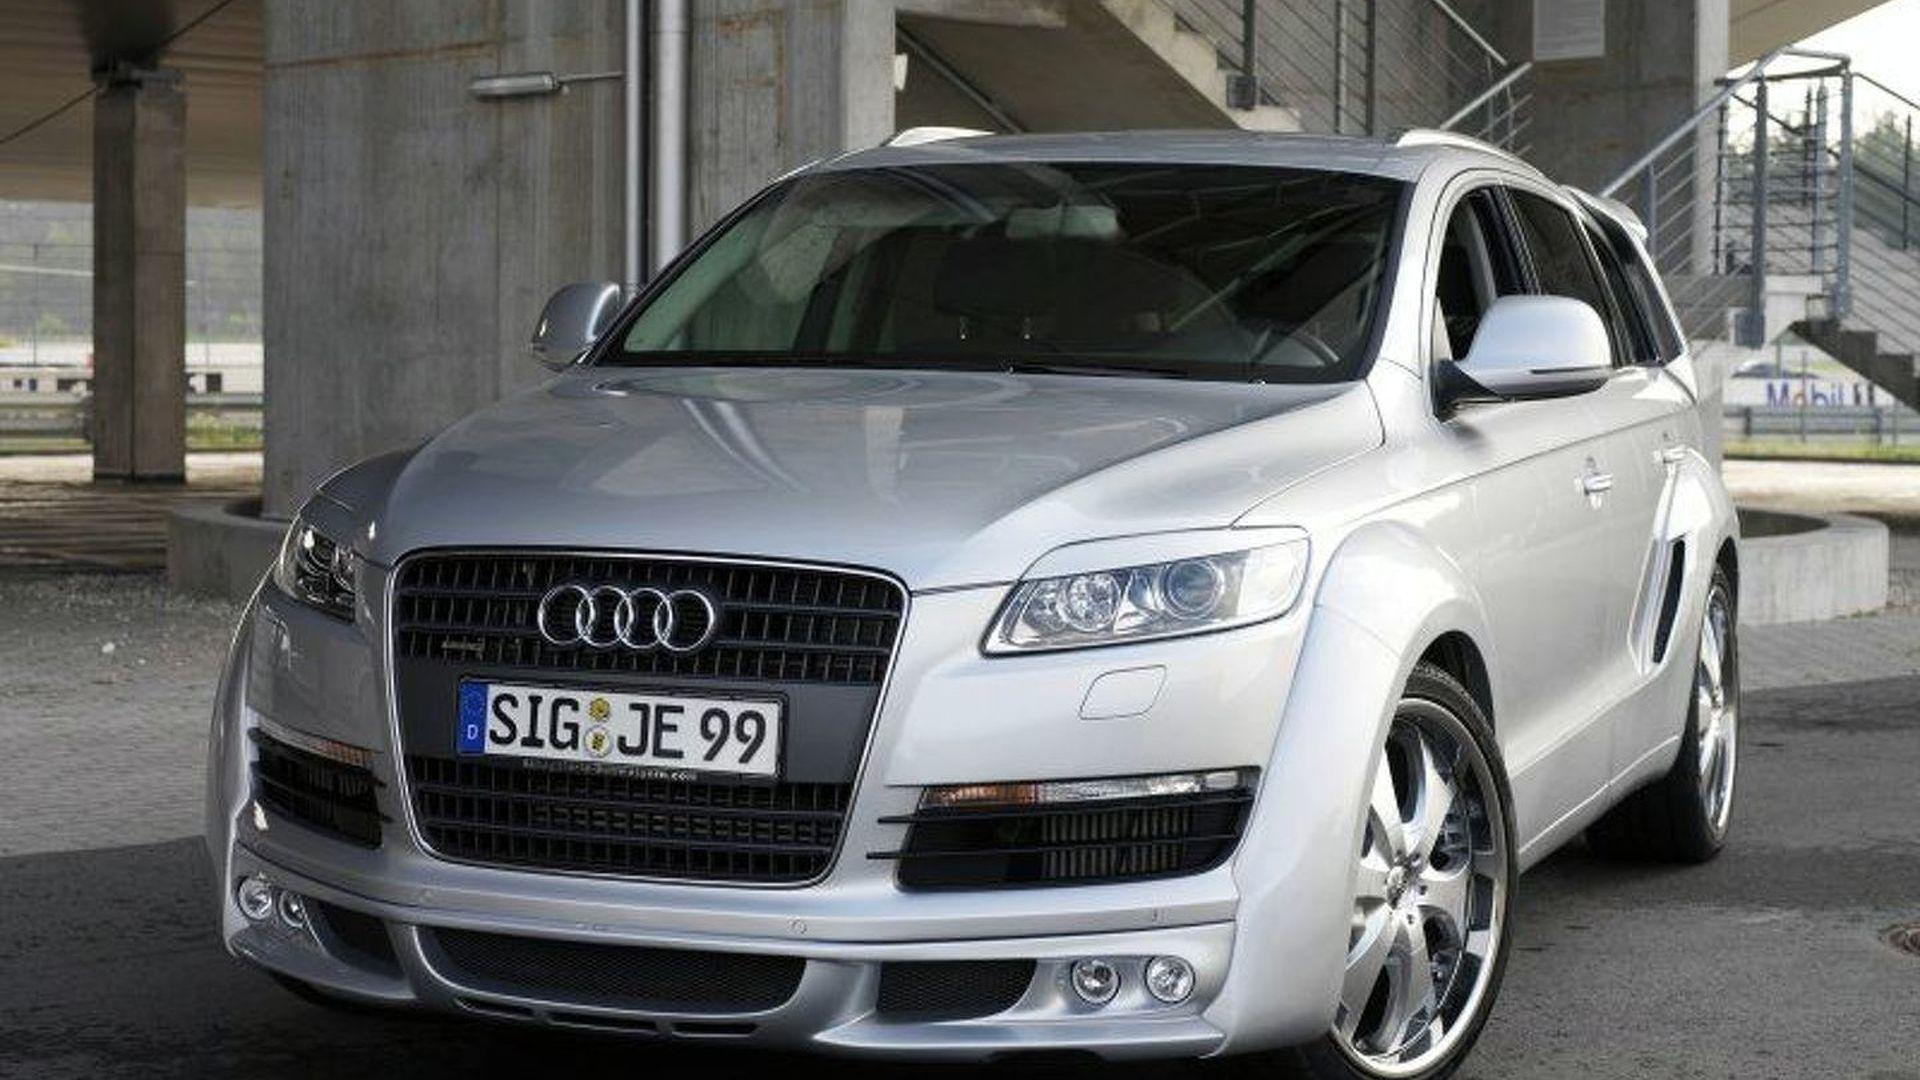 WCF Test Drive JE Design Q Widebody - Audi test drive